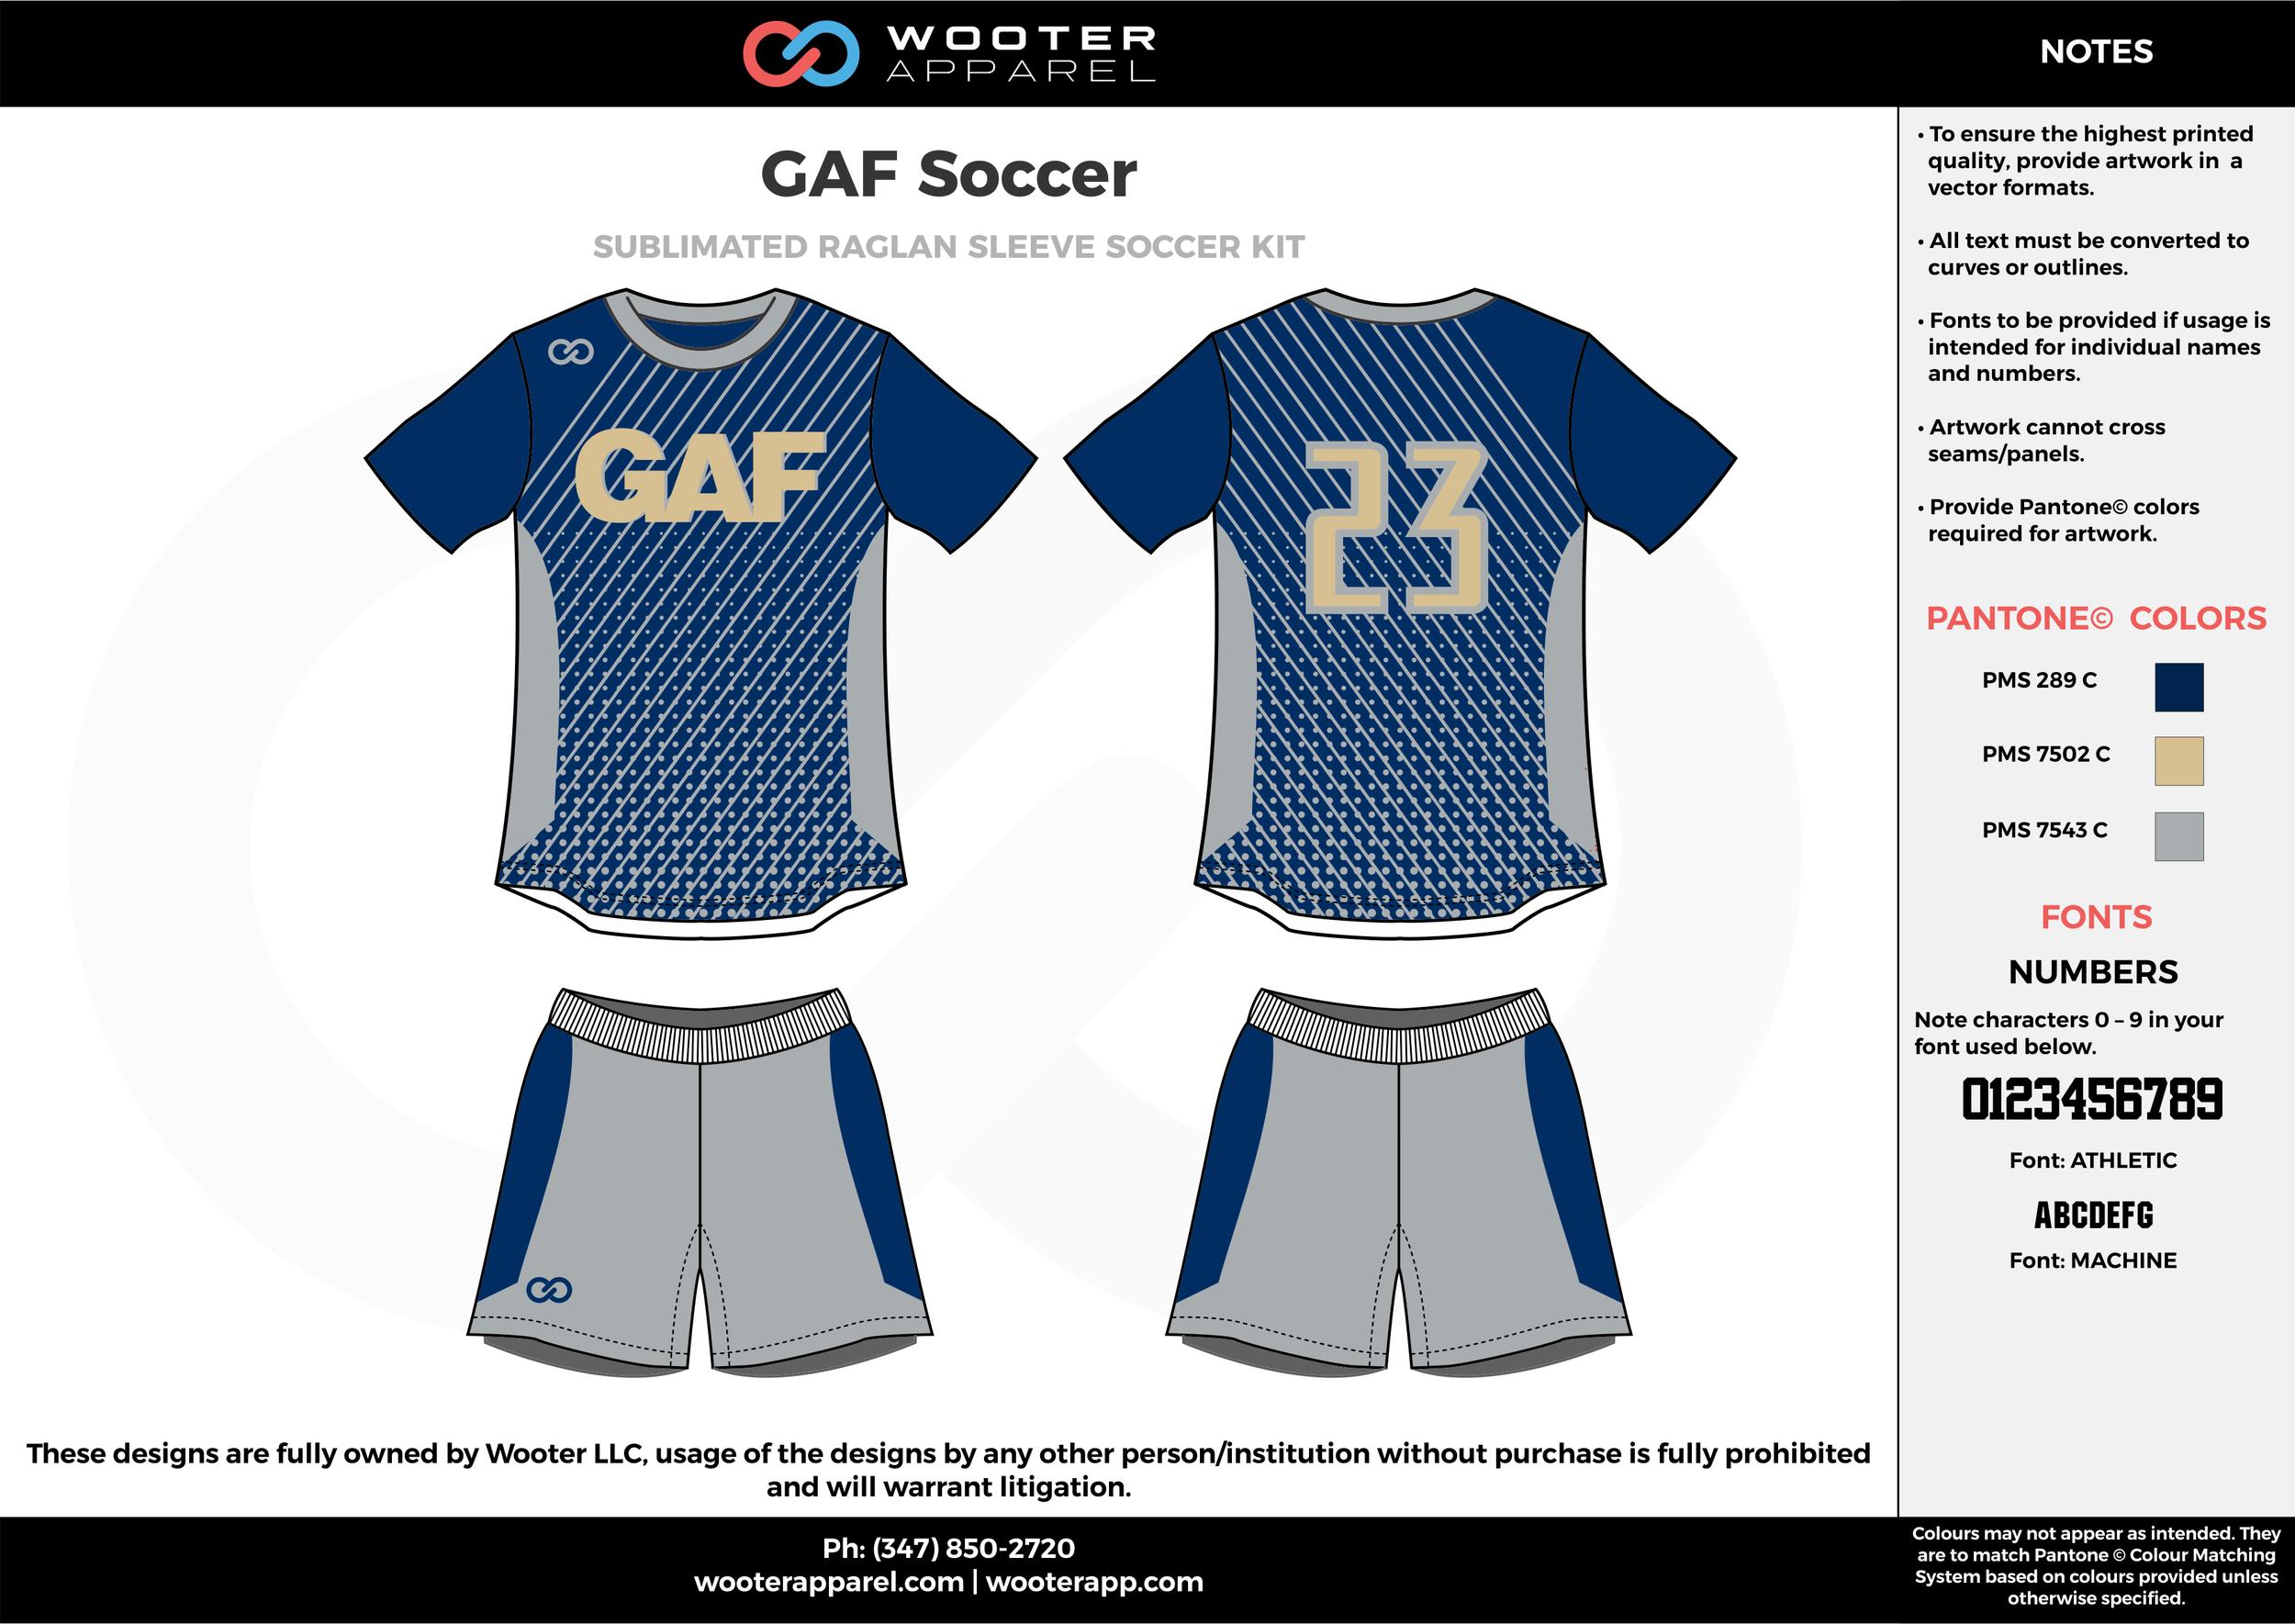 GAF Soccer navy blue gray beige custom sublimated soccer uniform jersey shirt shorts